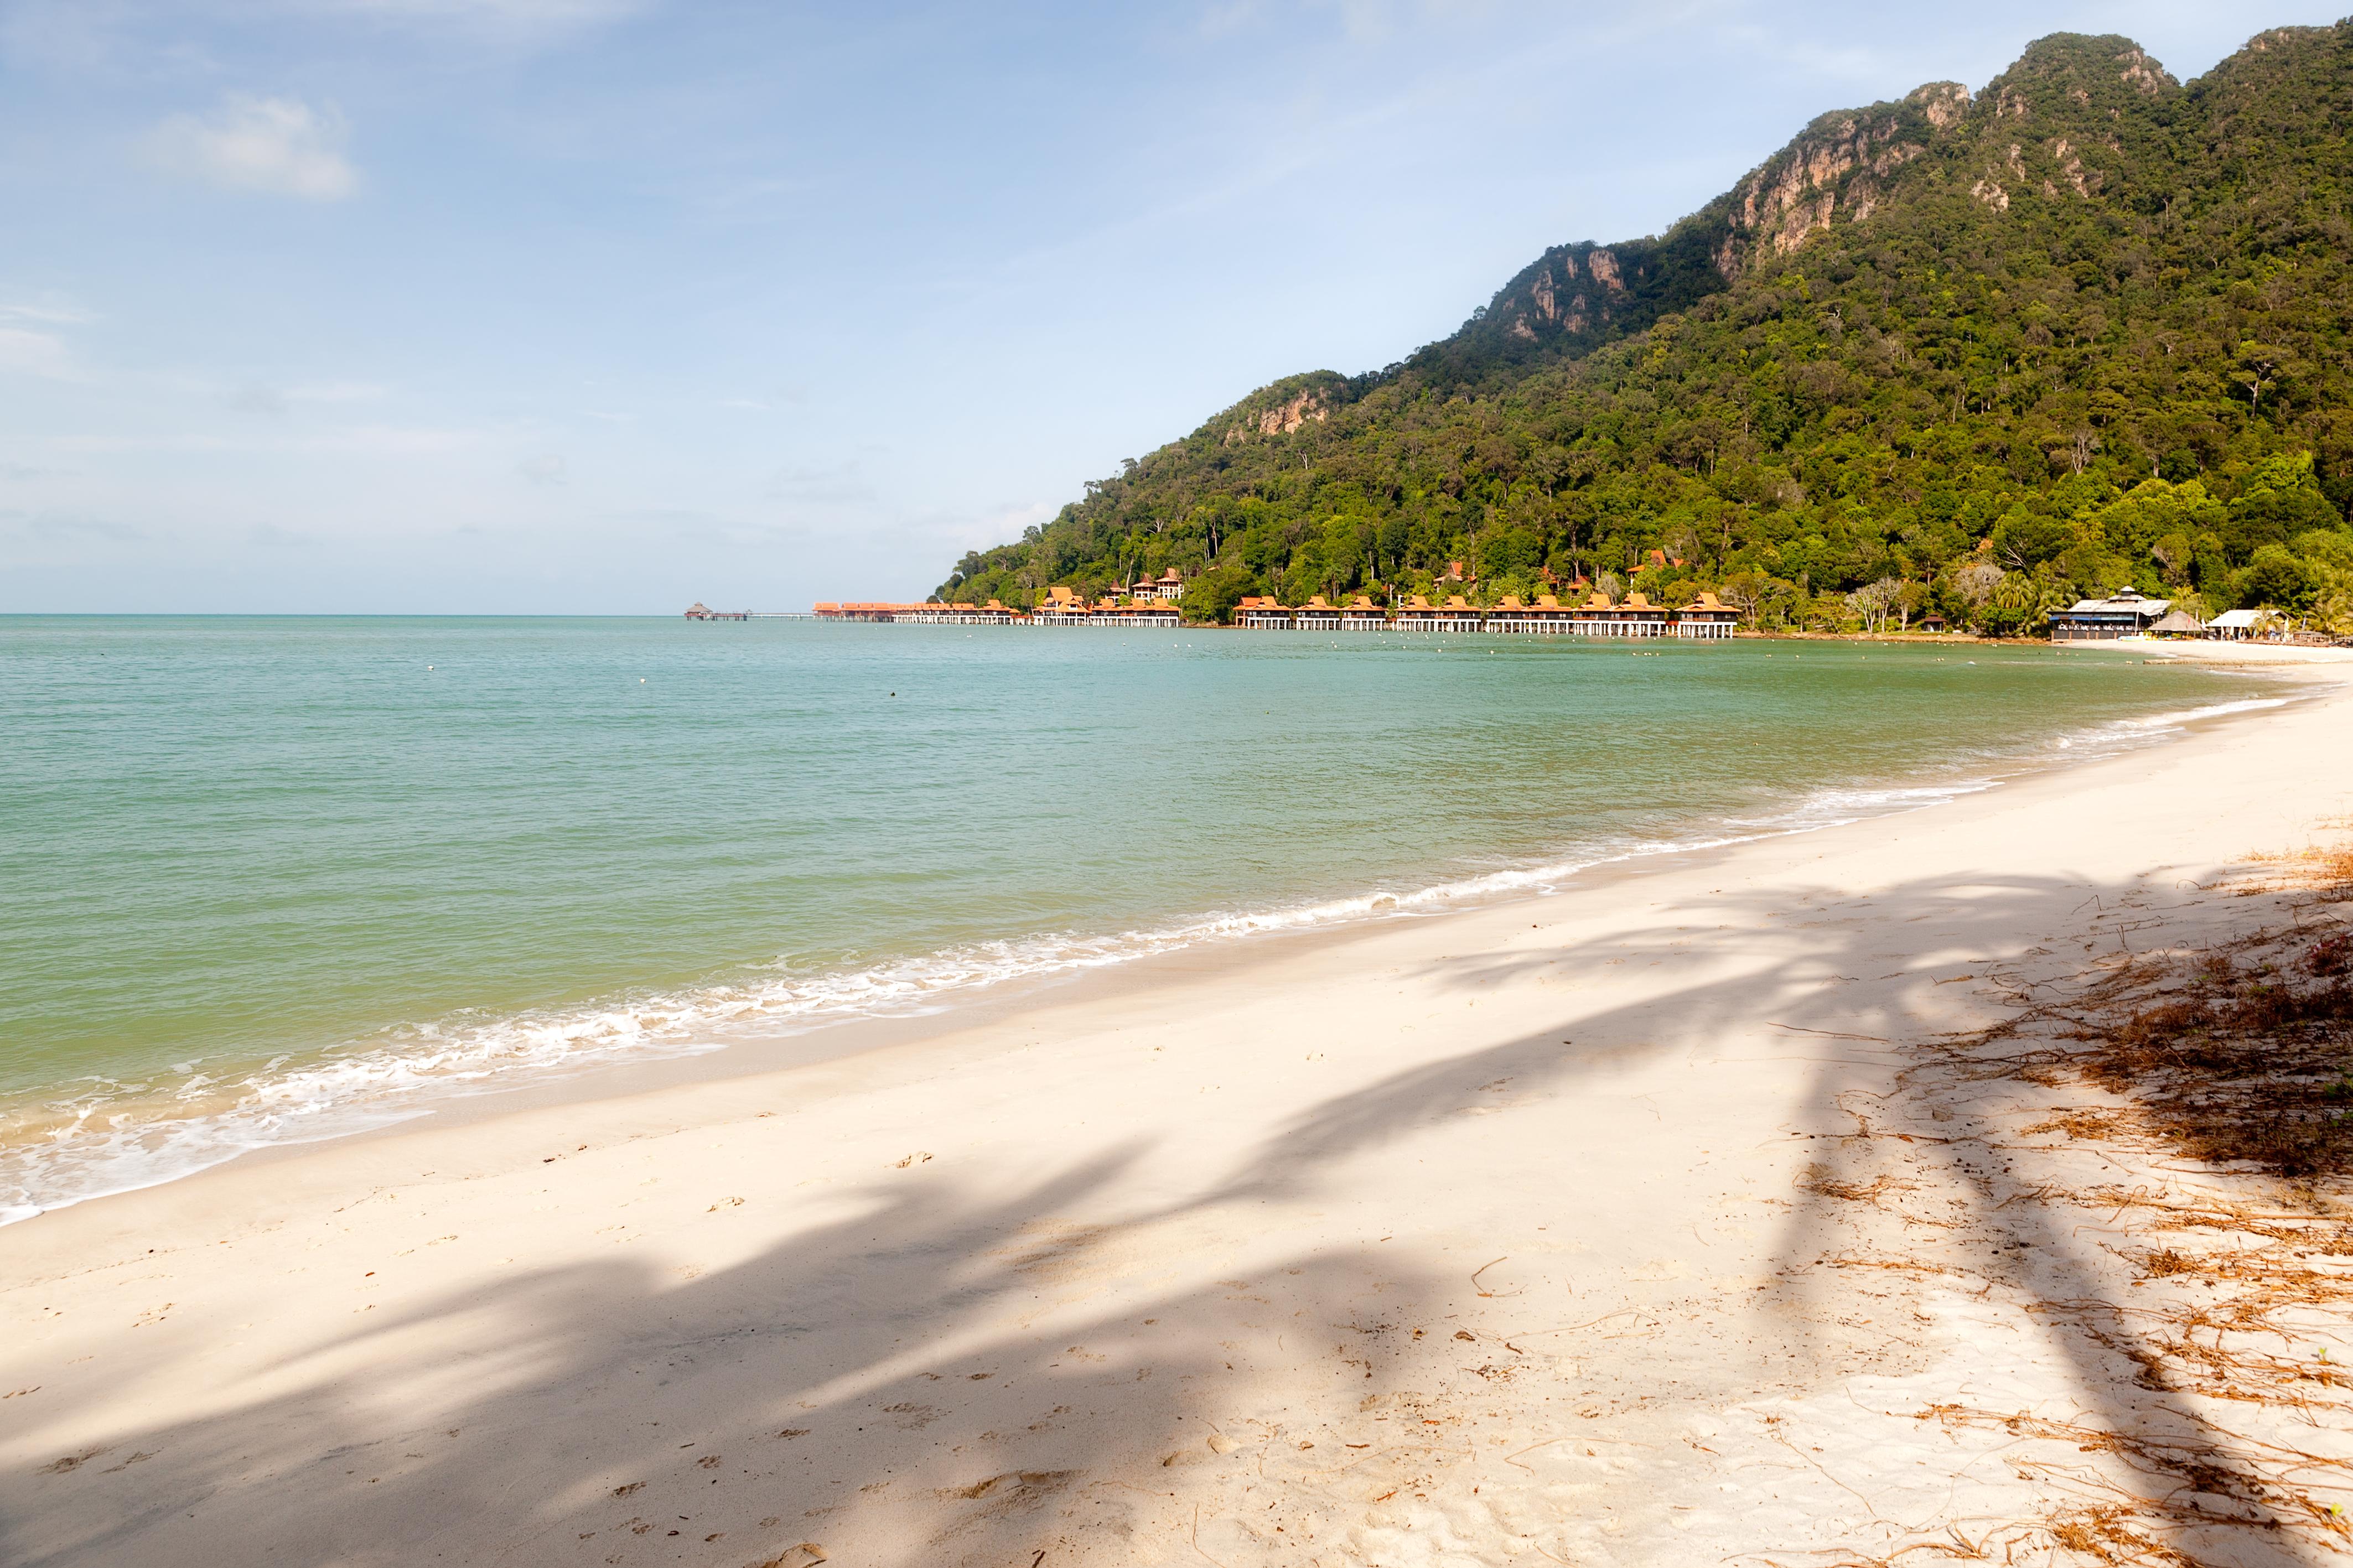 Http Commons Wikimedia Org Wiki File Langkawi Beach Jpg